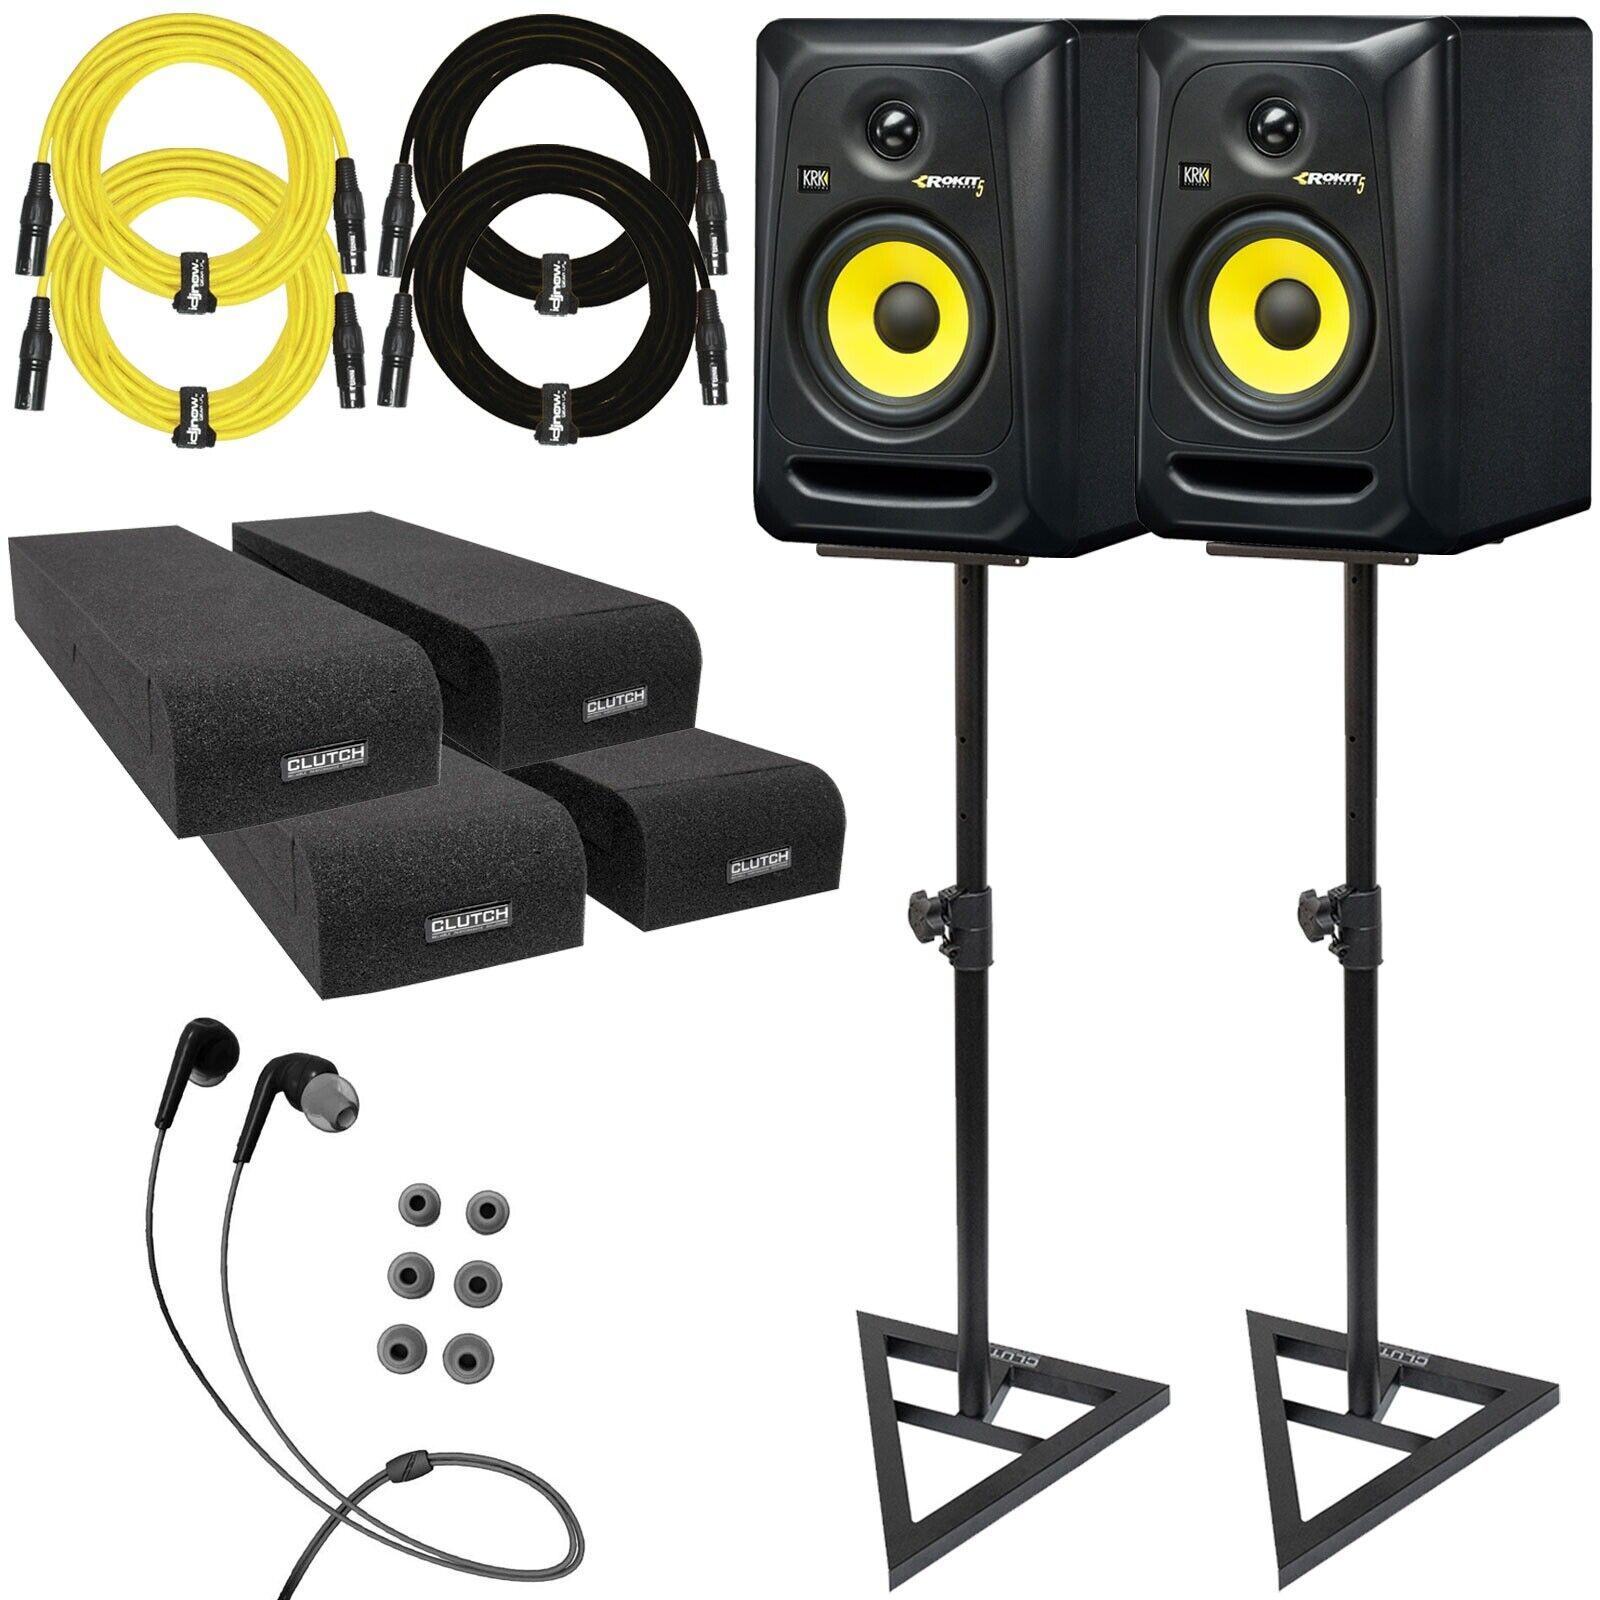 KRK ROKIT 5 G3 5 Active Bi-Amped Studio Monitor Speakers